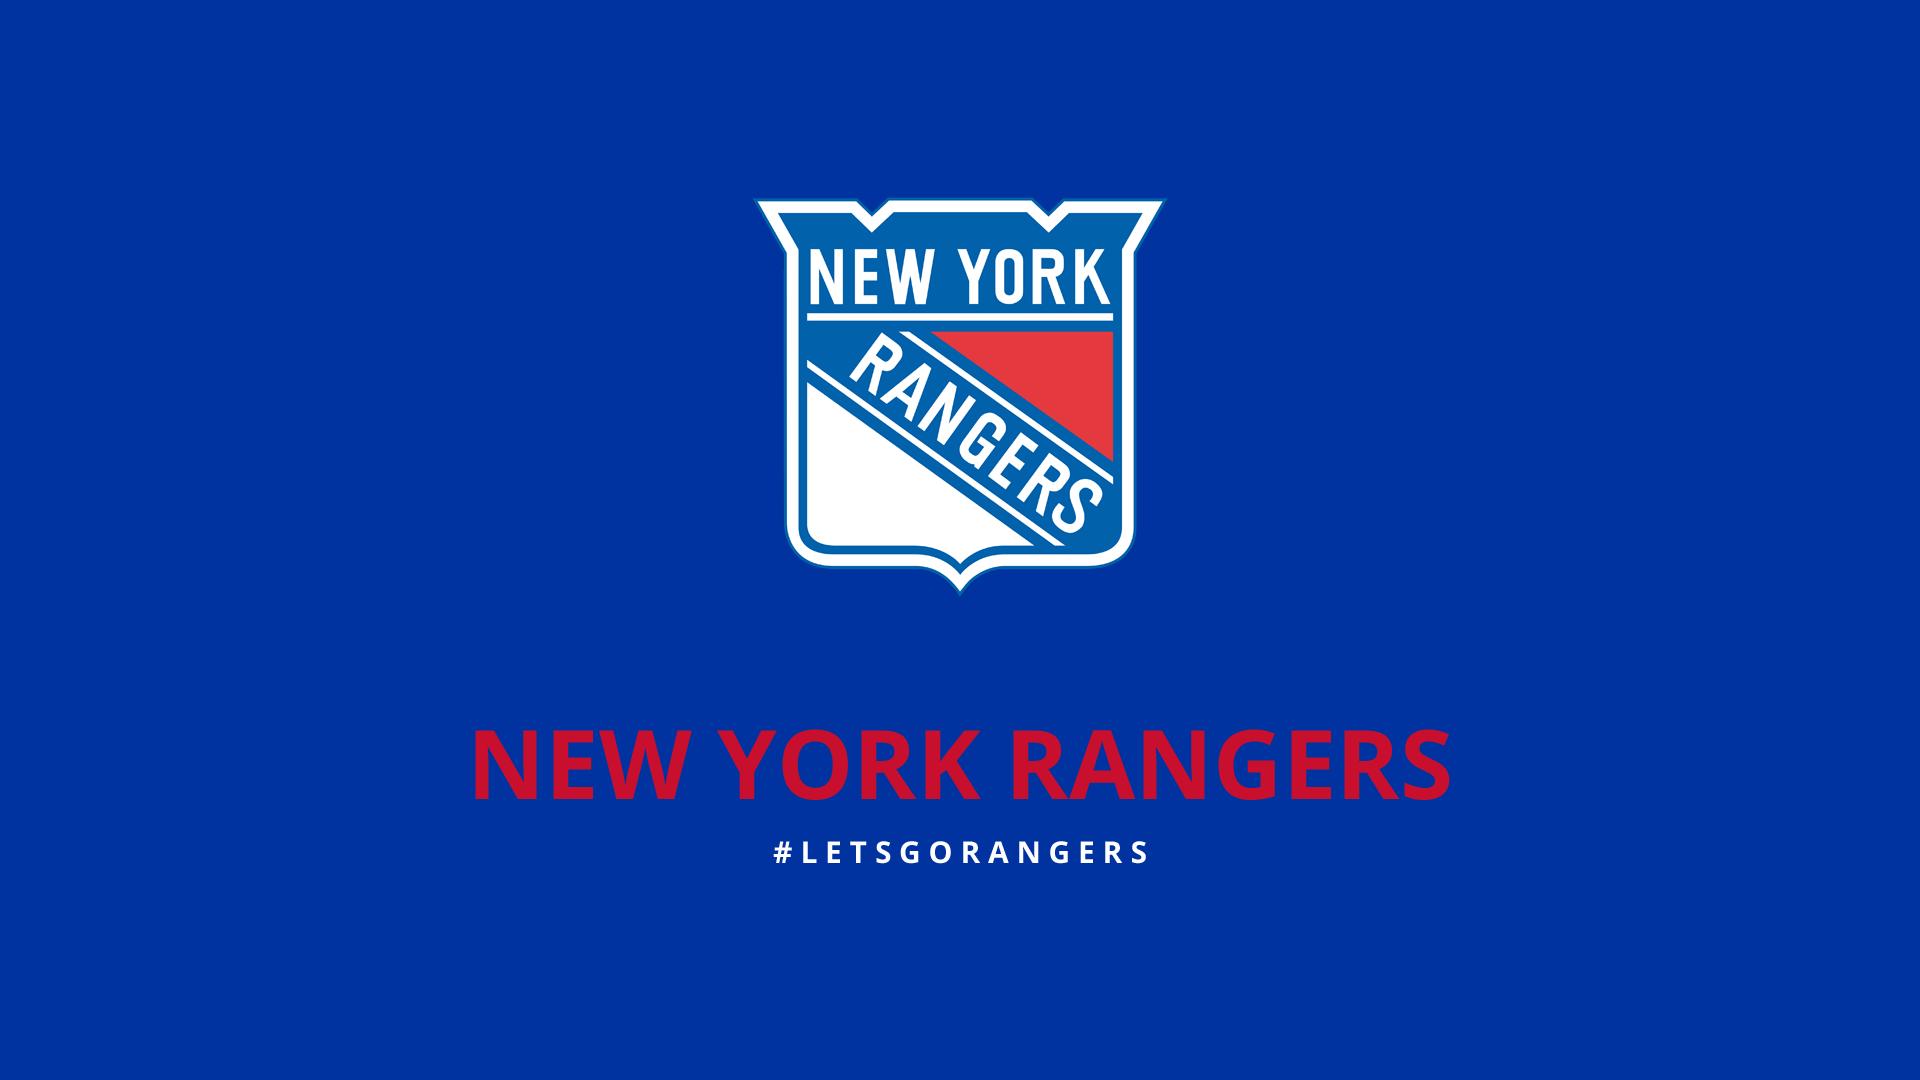 New York Rangers Backgrounds 1920x1080